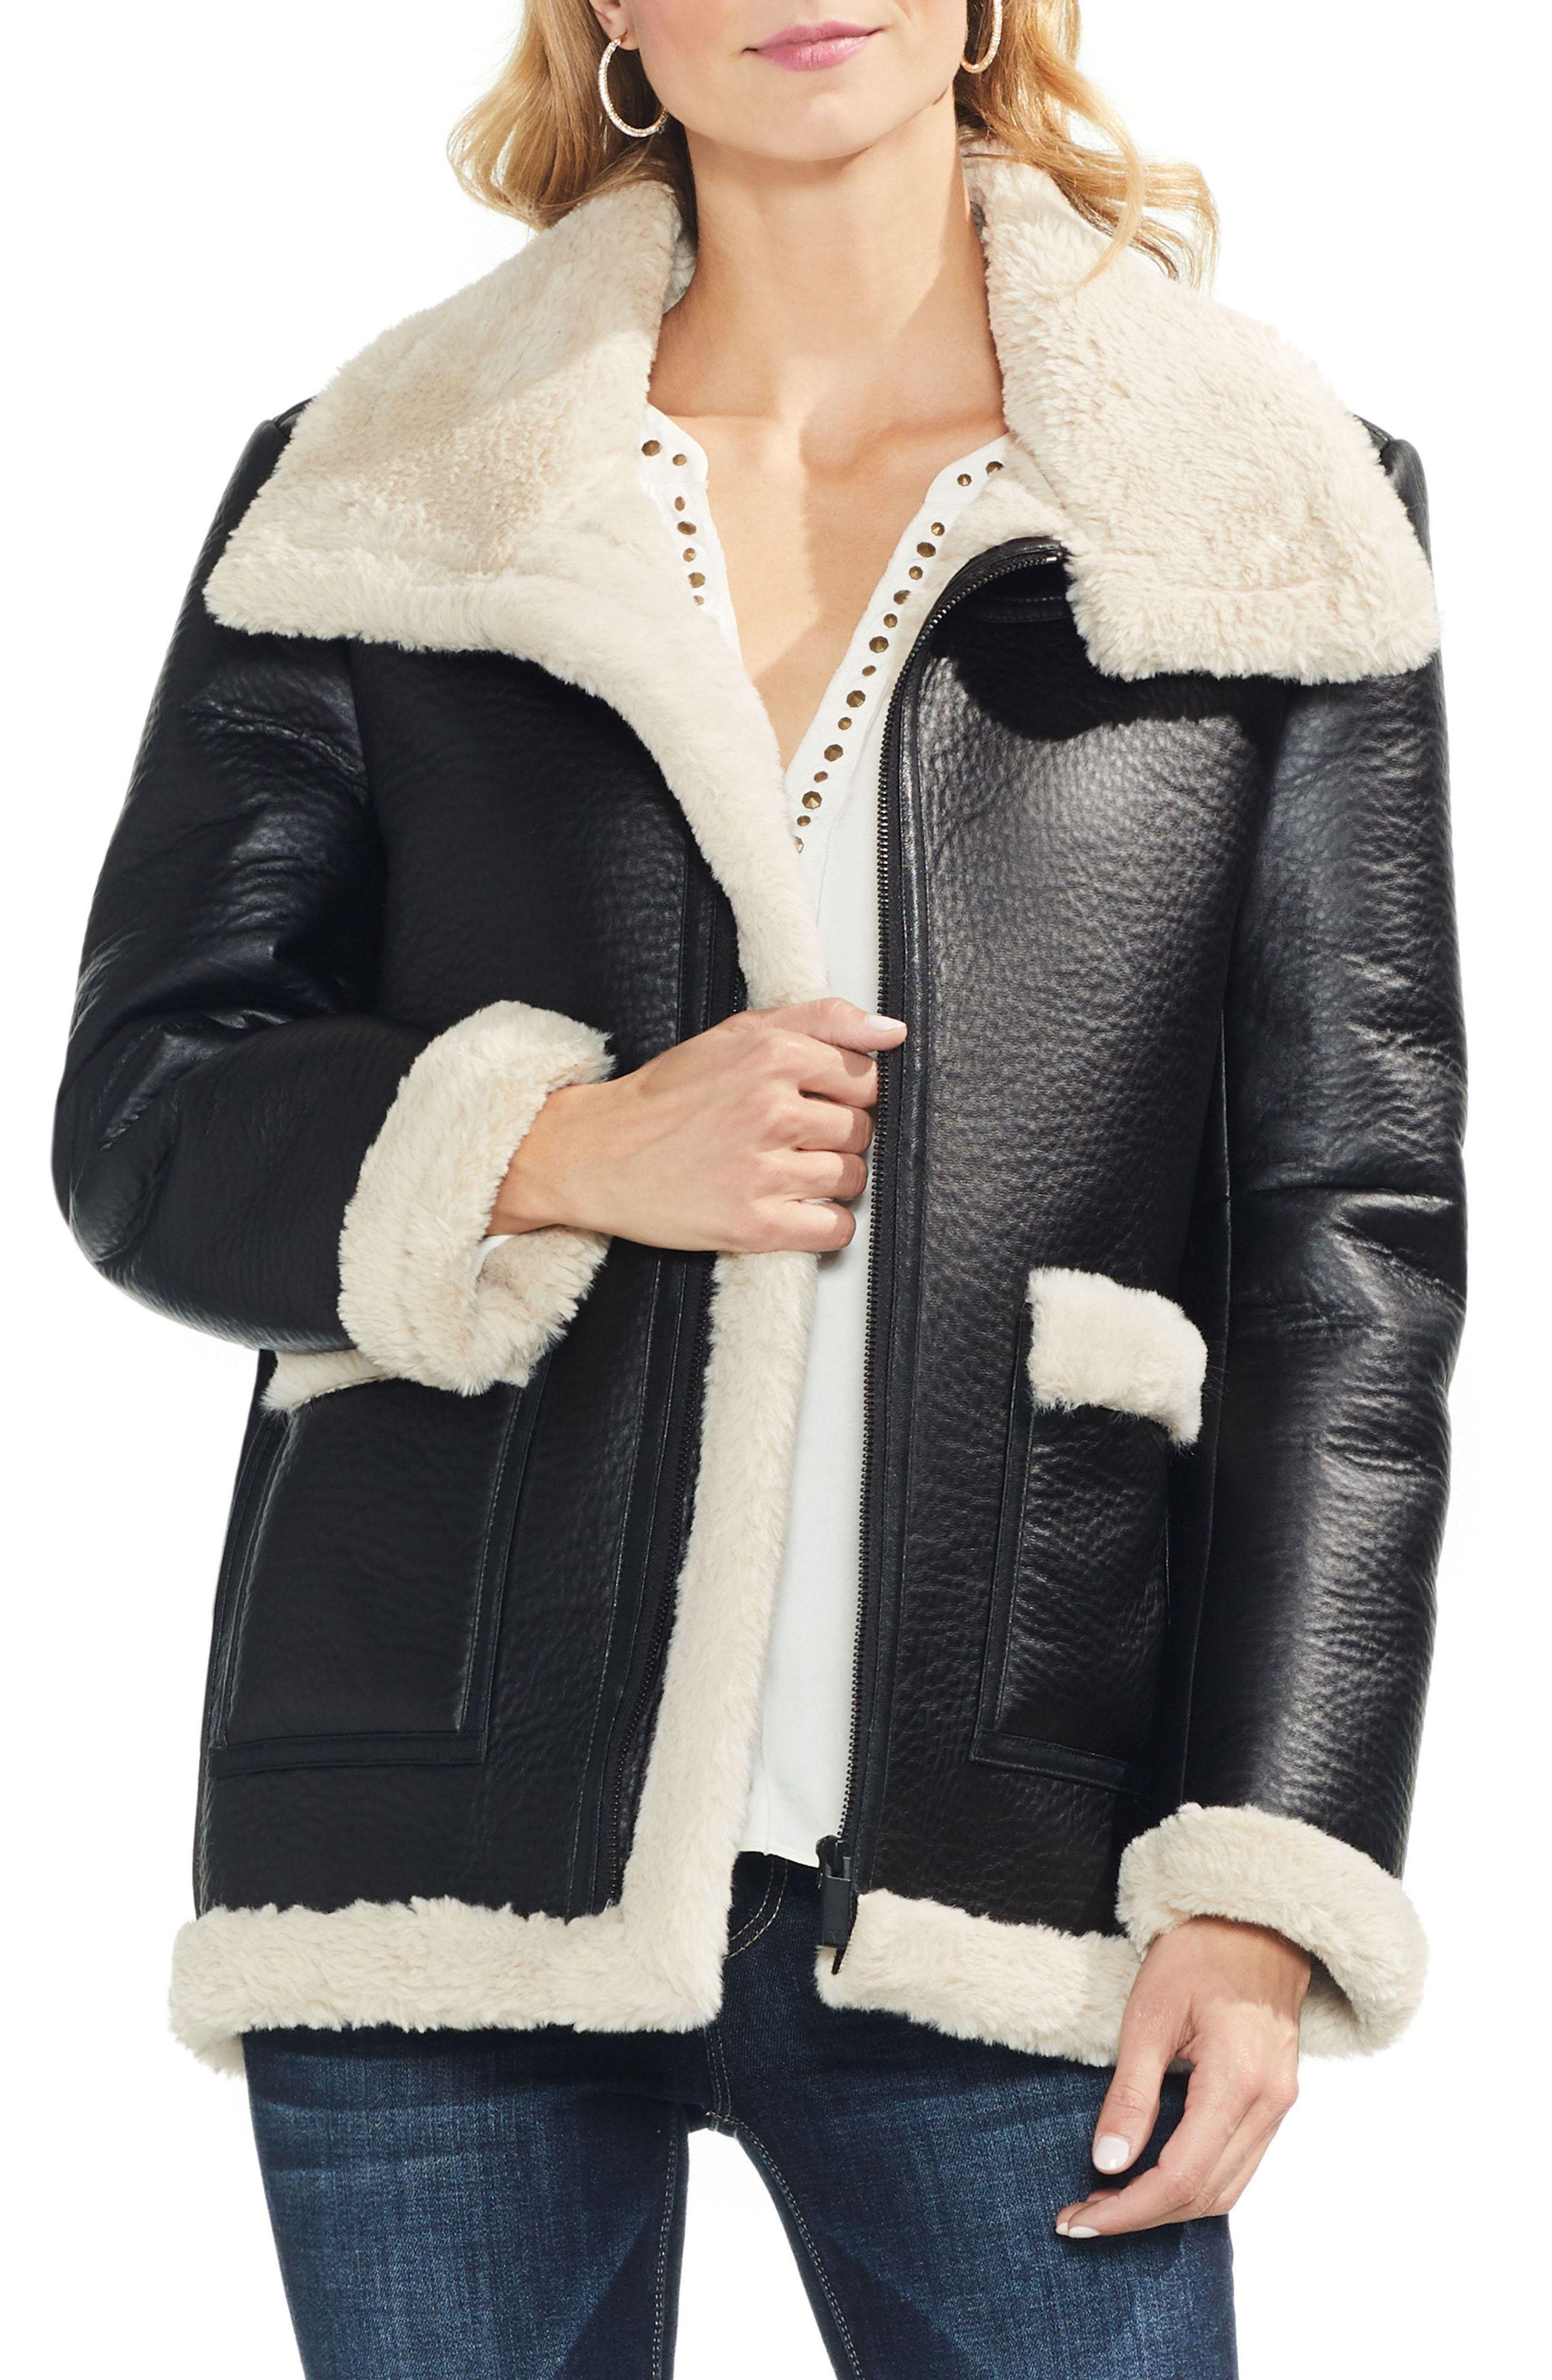 Vince Camuto Faux Leather Shearling Coat Blazer Jackets For Women Faux Shearling Jacket Shearling Coat [ 4048 x 2640 Pixel ]